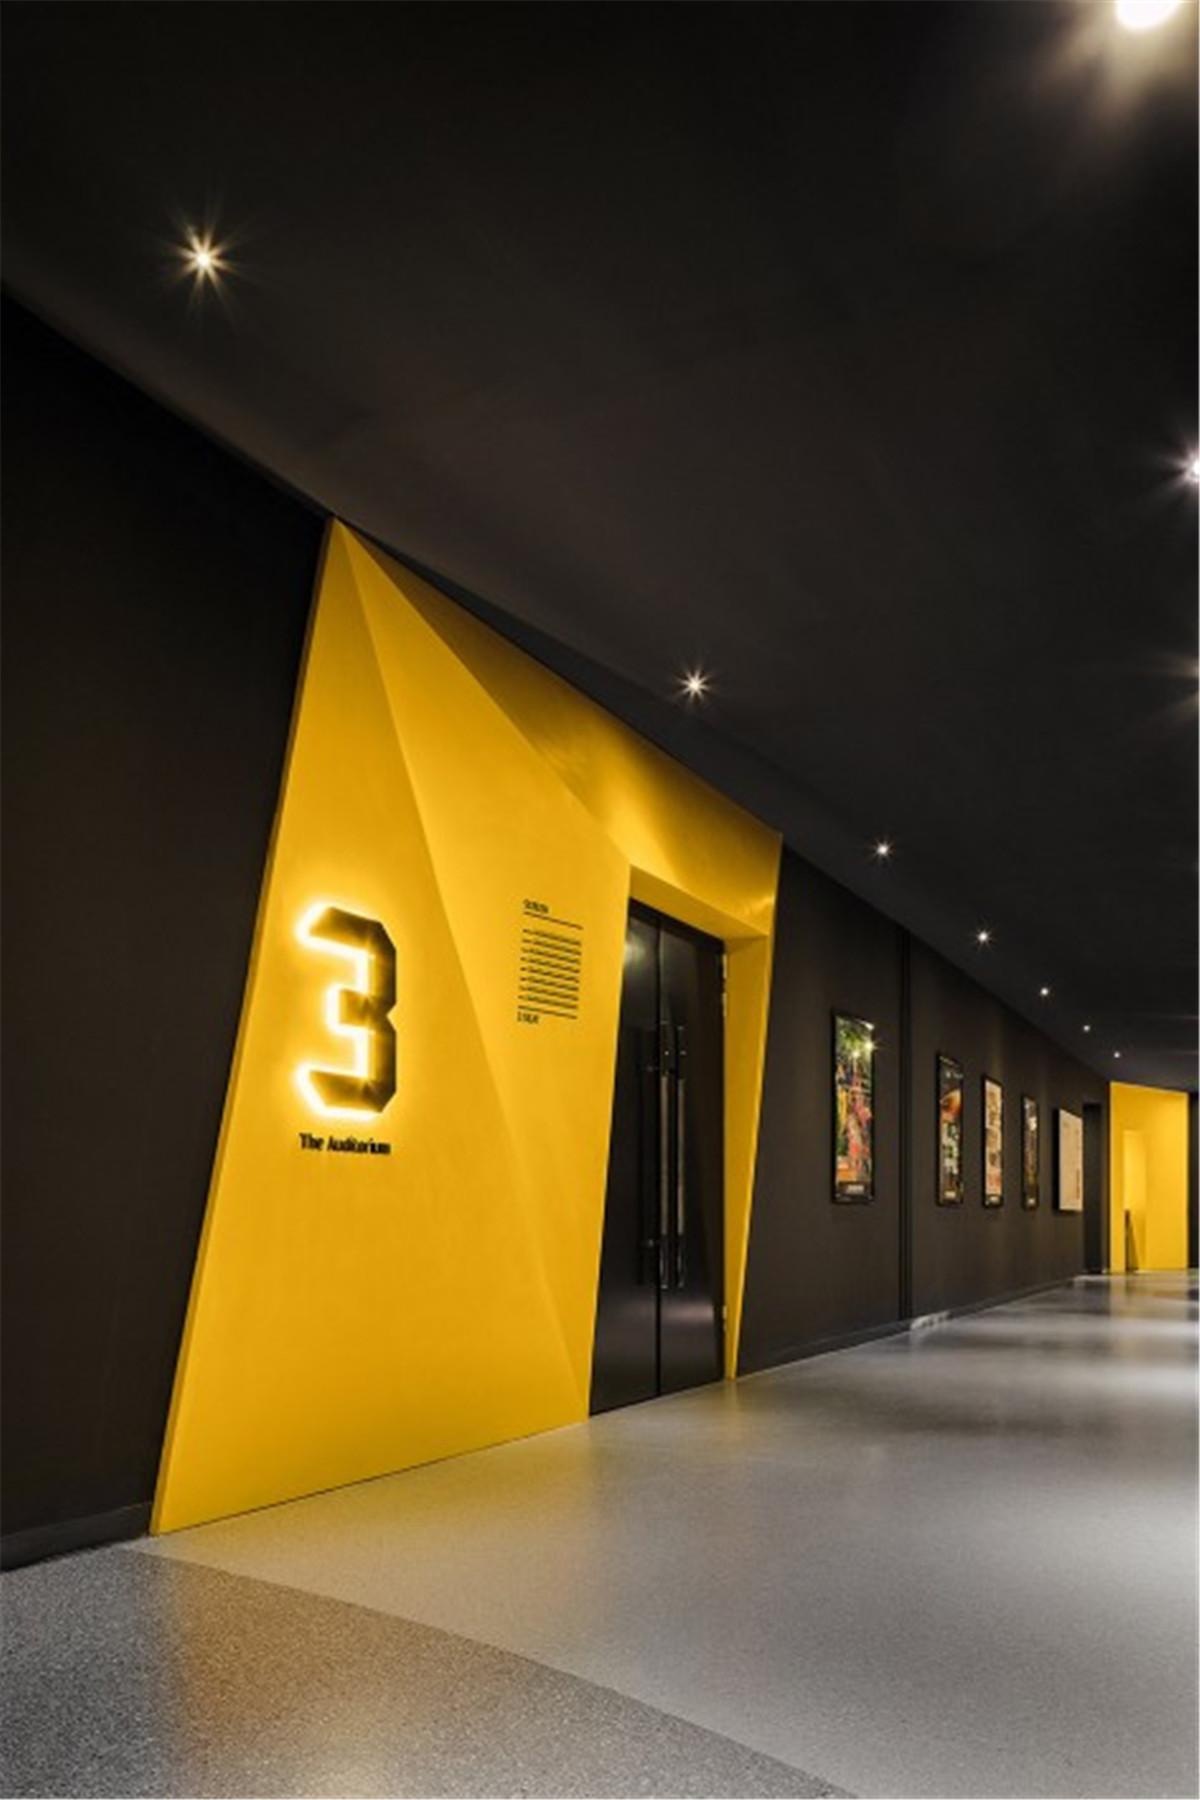 012-Cinema-of-Vitality-in-Yellow-Origami-Baichuan-International-Cinema-By-UM-DESIGN-472x708